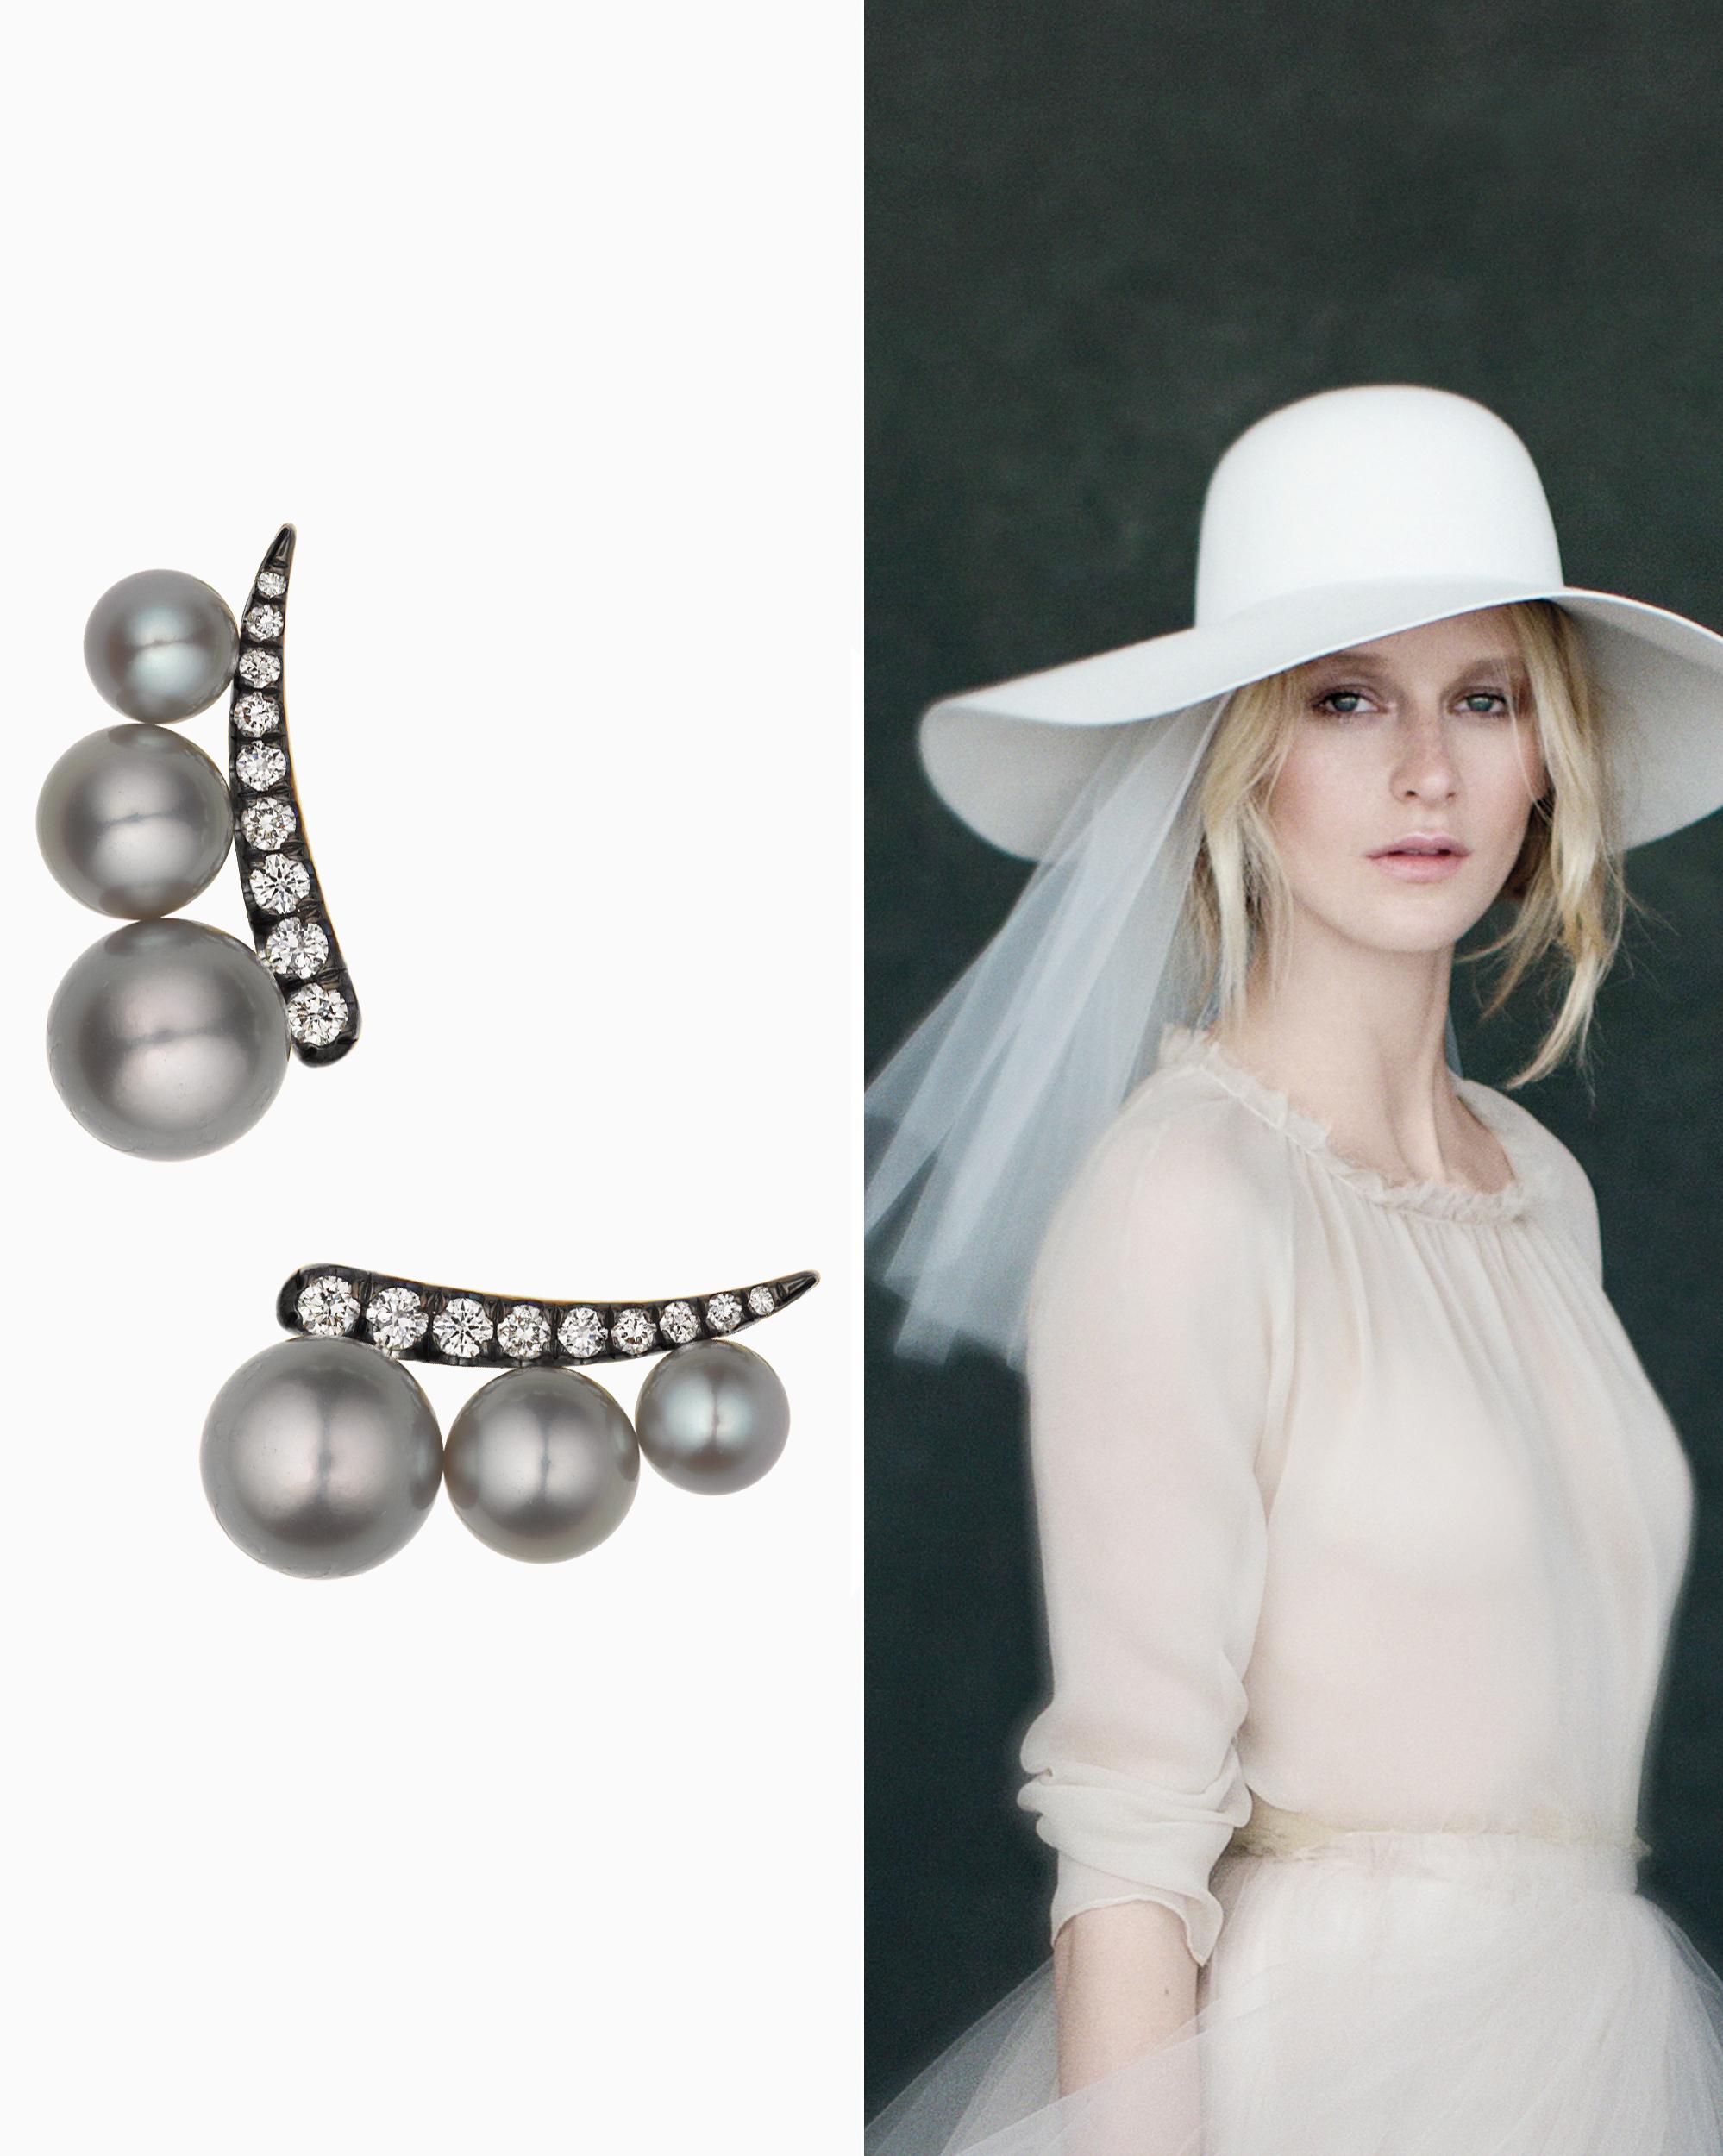 veil-earring-pairs-hat-jemma-wynne-climbers-1115.jpg